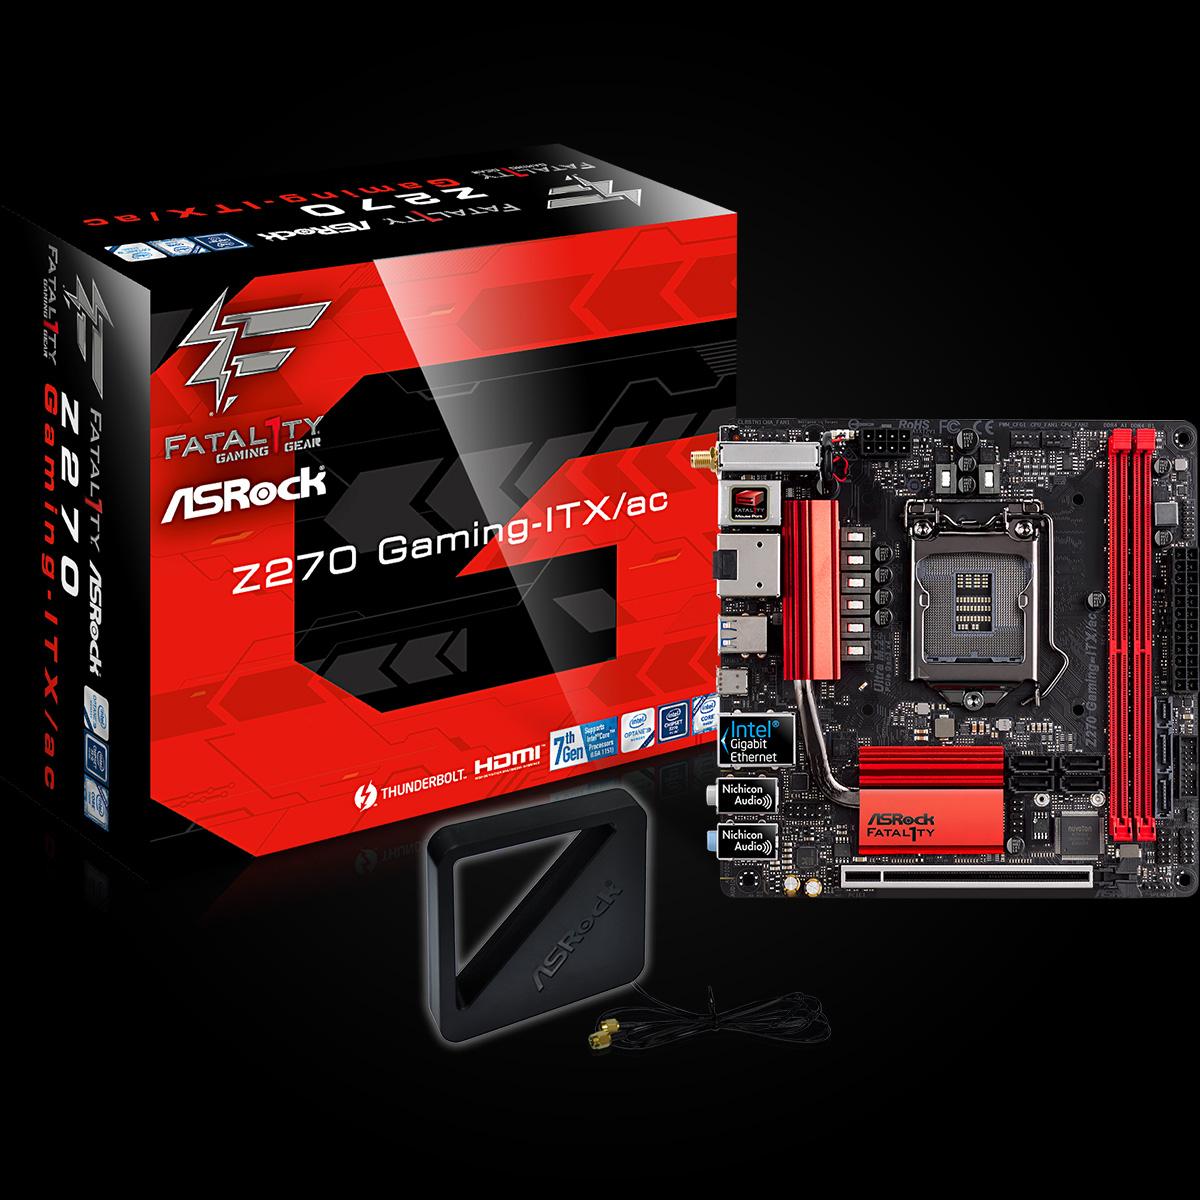 ASRock Fatal1ty Z270 Gaming-ITX/ac alaplap bemutató - www.itfroccs.hu